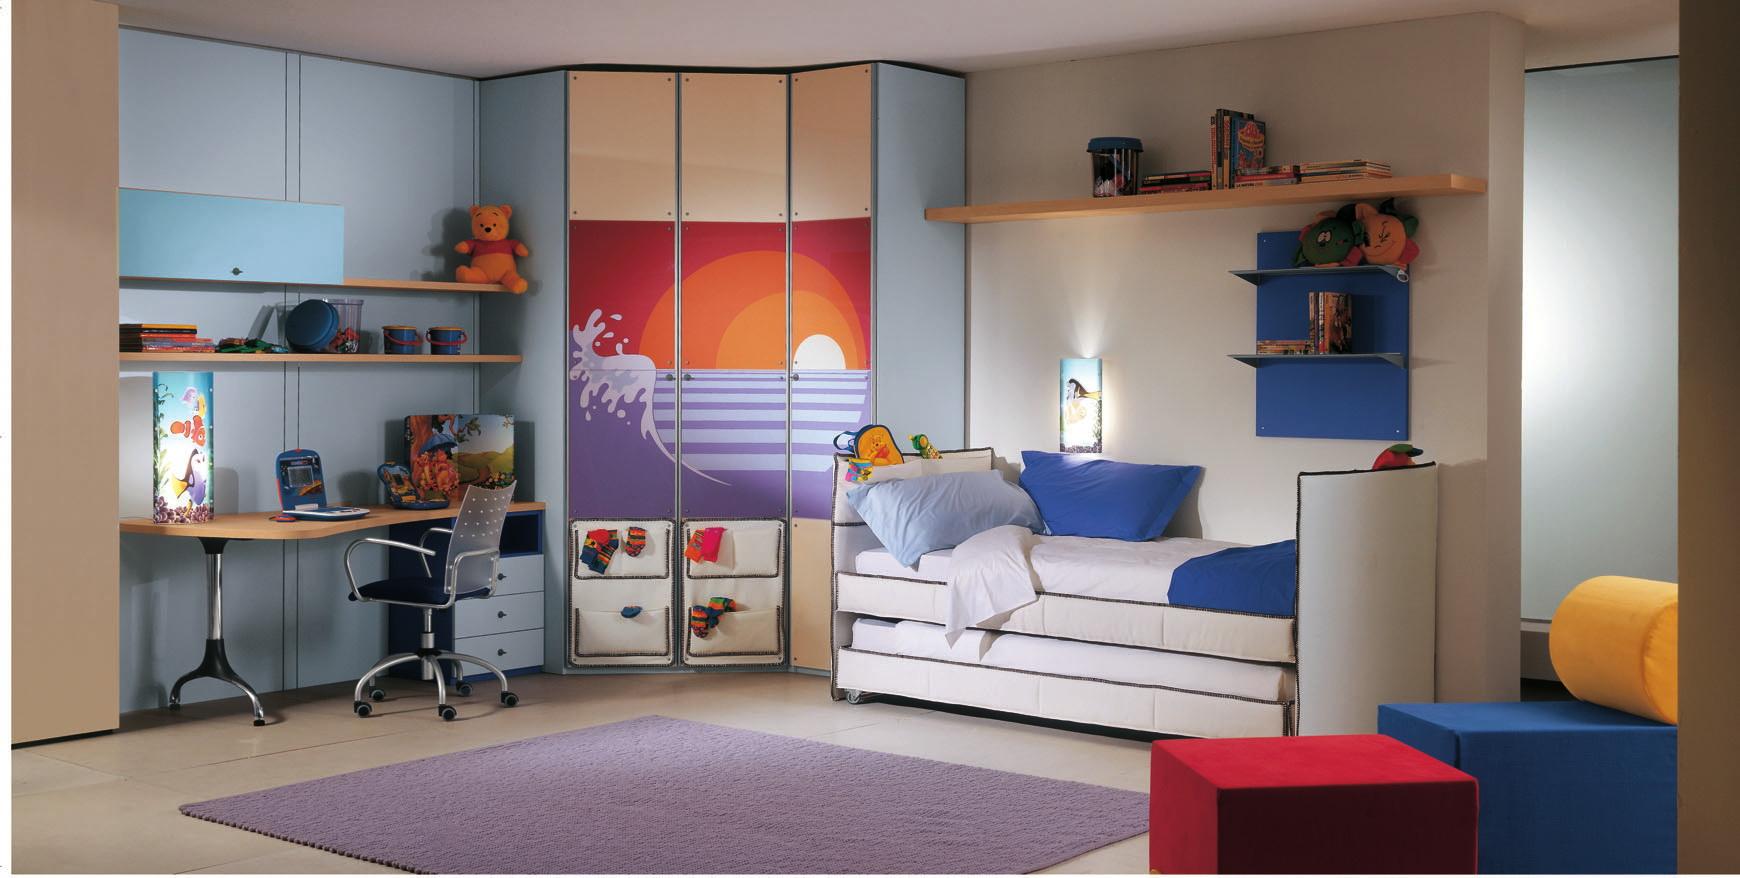 blue-theme-Mates-Beds-bedroom-decor blue theme Mates Beds bedroom decor